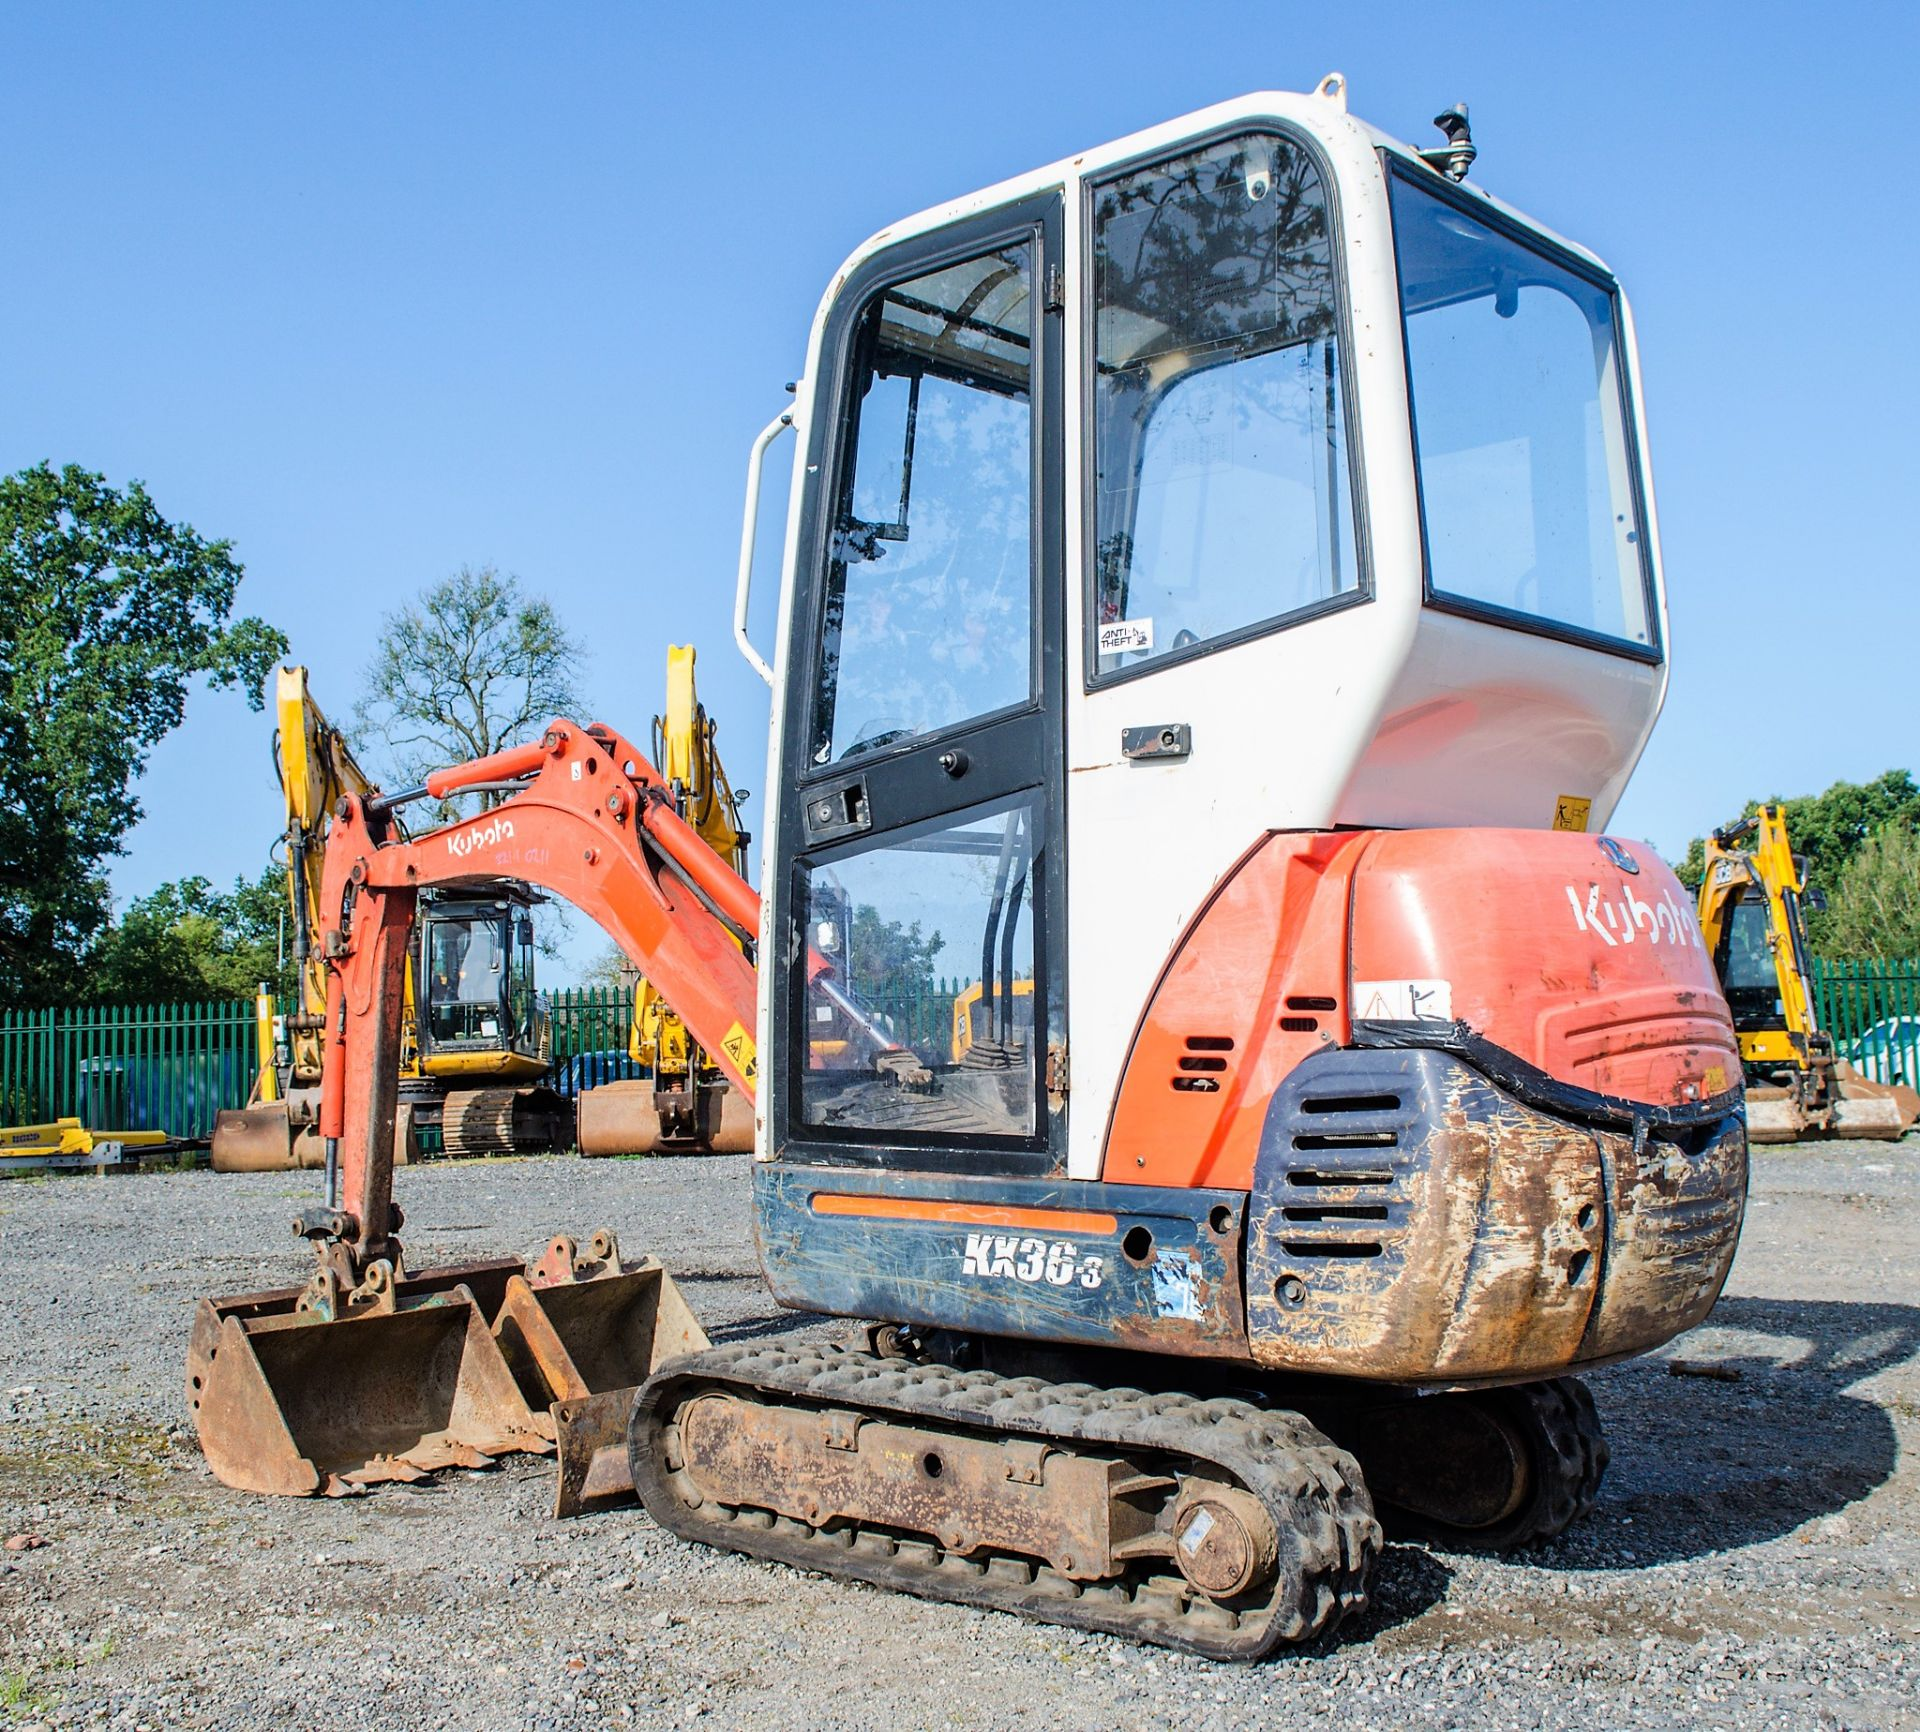 Kubota KX36-3 1.5 tonne rubber tracked mini excavator Year: 2007 S/N: Z077298 Recorded Hours: 4205 - Image 3 of 18